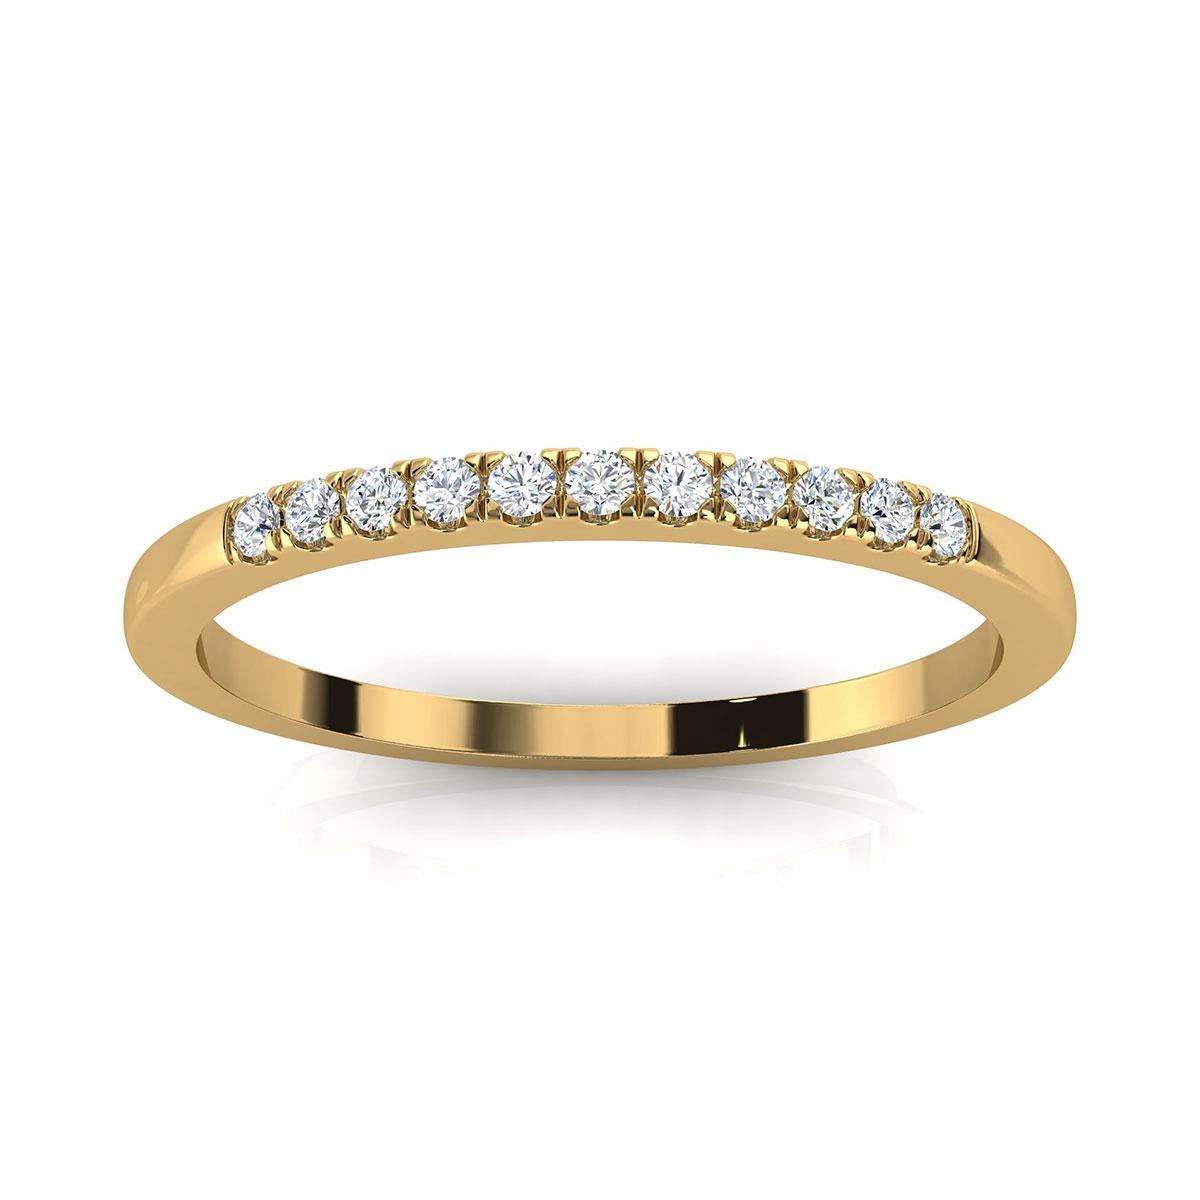 14K Yellow Gold Anilera Minimalist Diamond Ring ( 1/10 ct. tw)